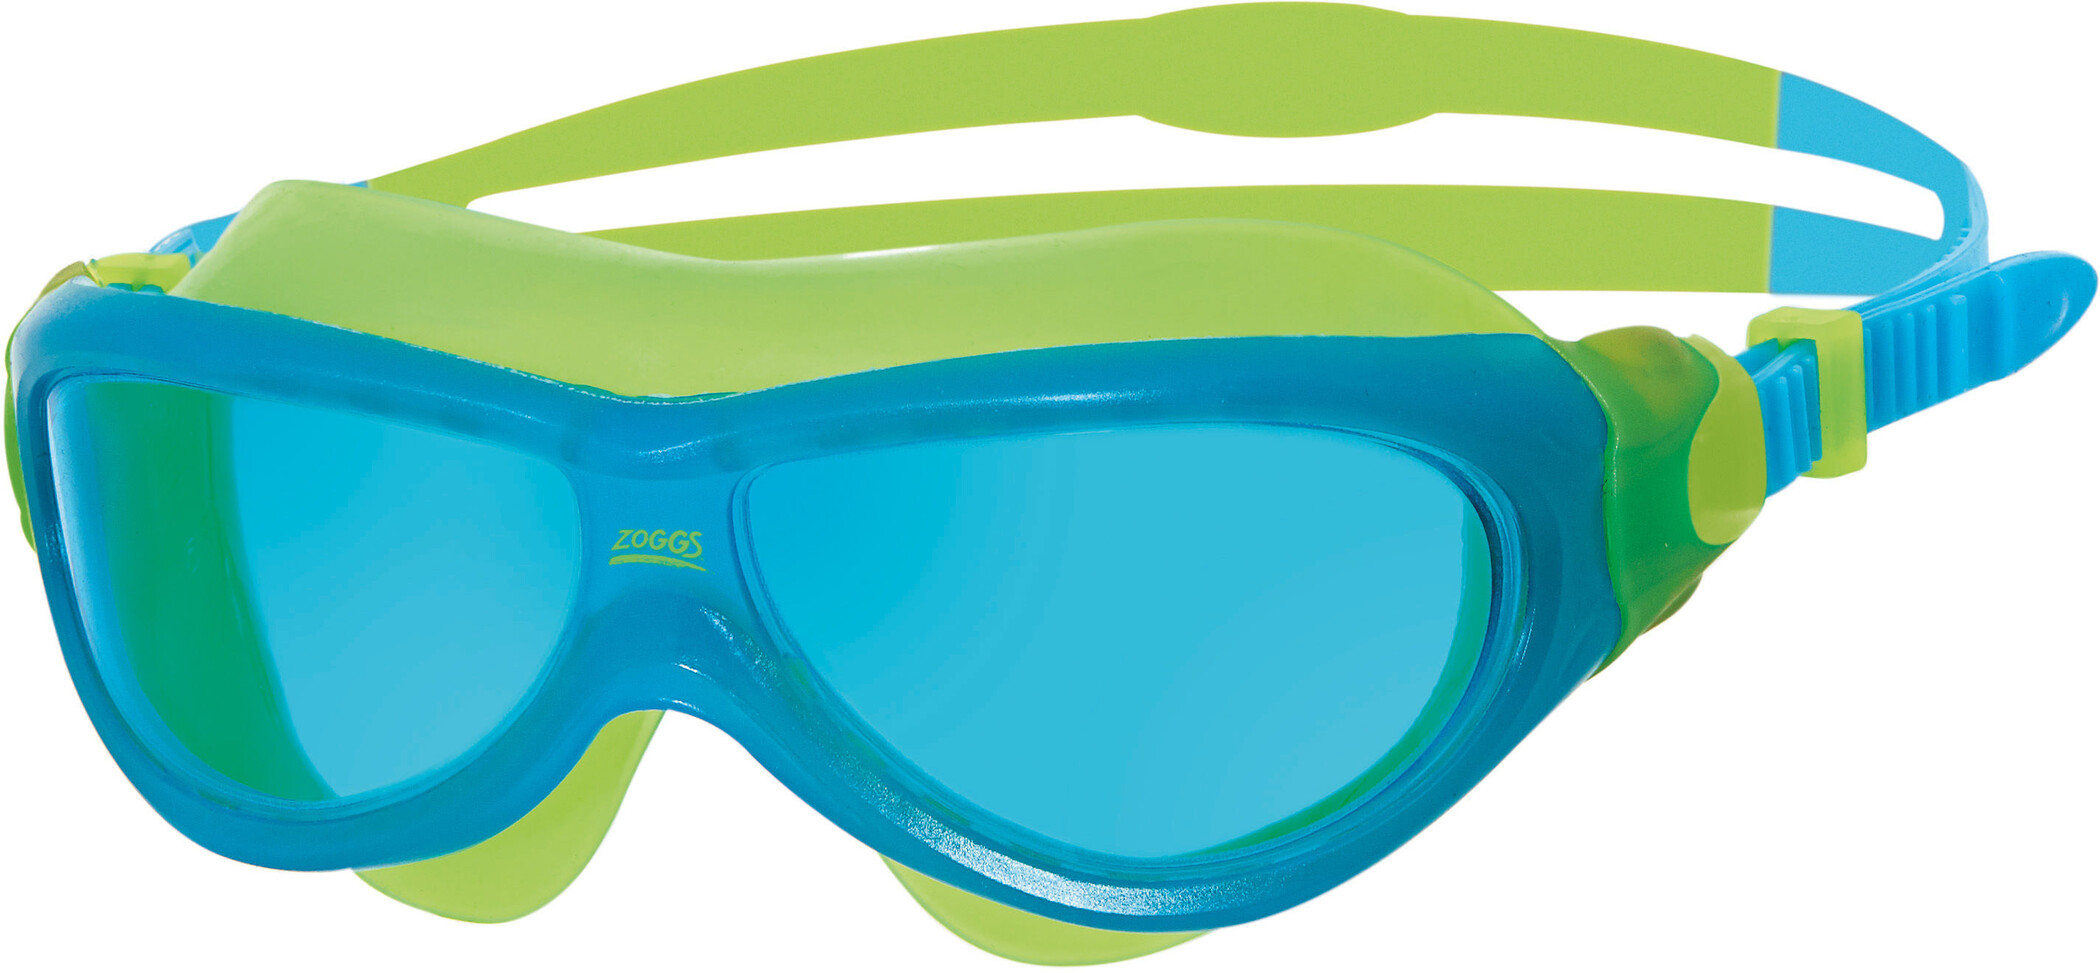 Zoggs Phantom Svømmebriller Børn, blue/yellow/tint (2019) | swim_clothes